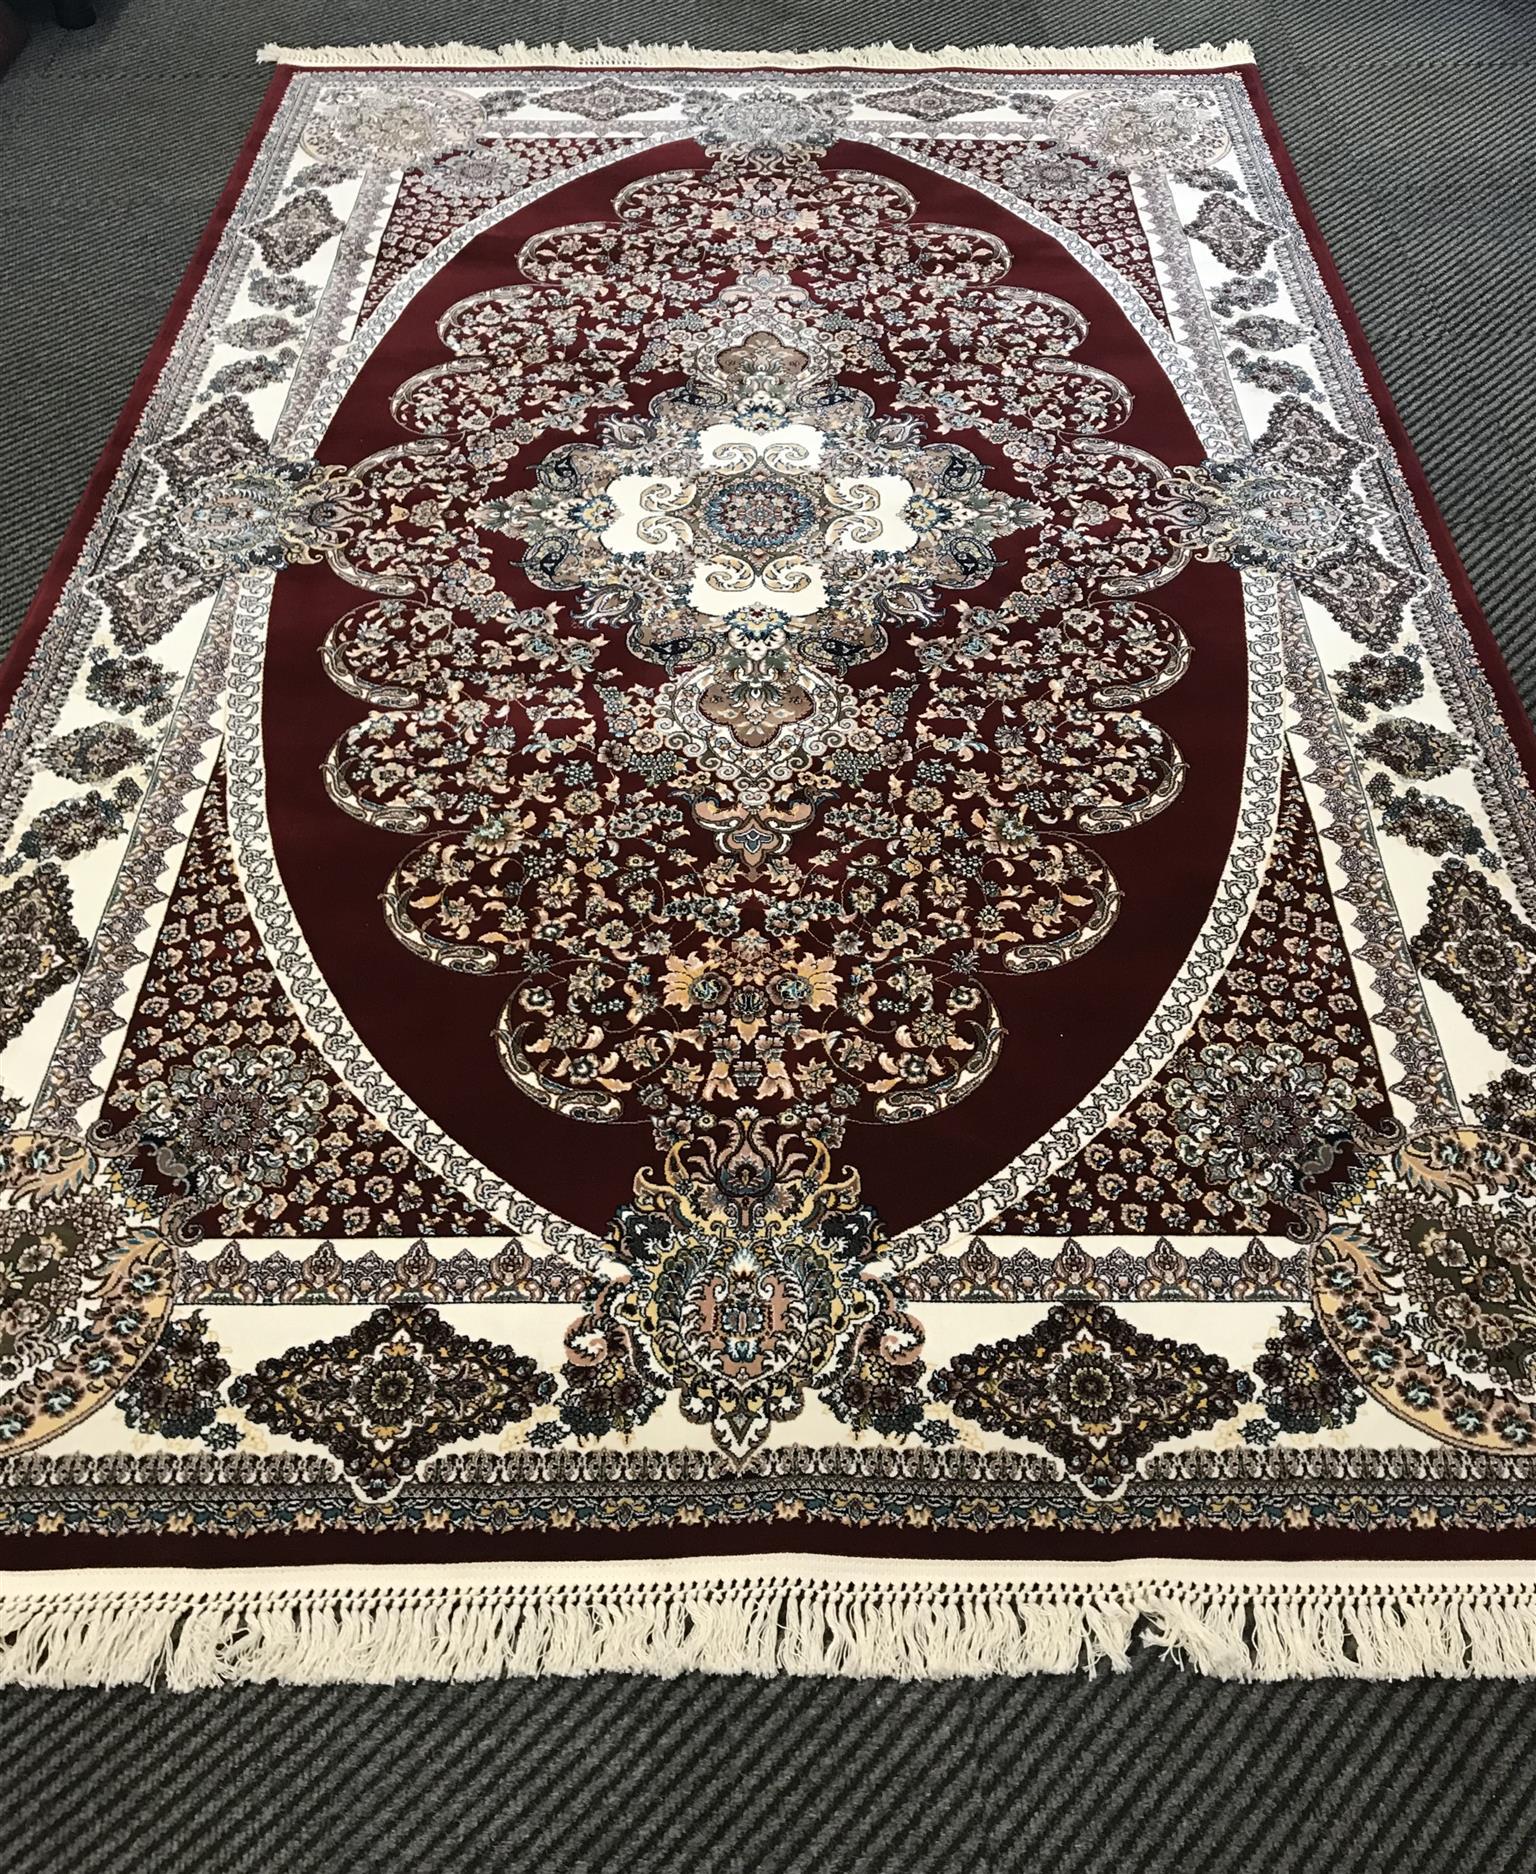 BRAND NEW PERSIAN CARPET 2.1m X 1.8m